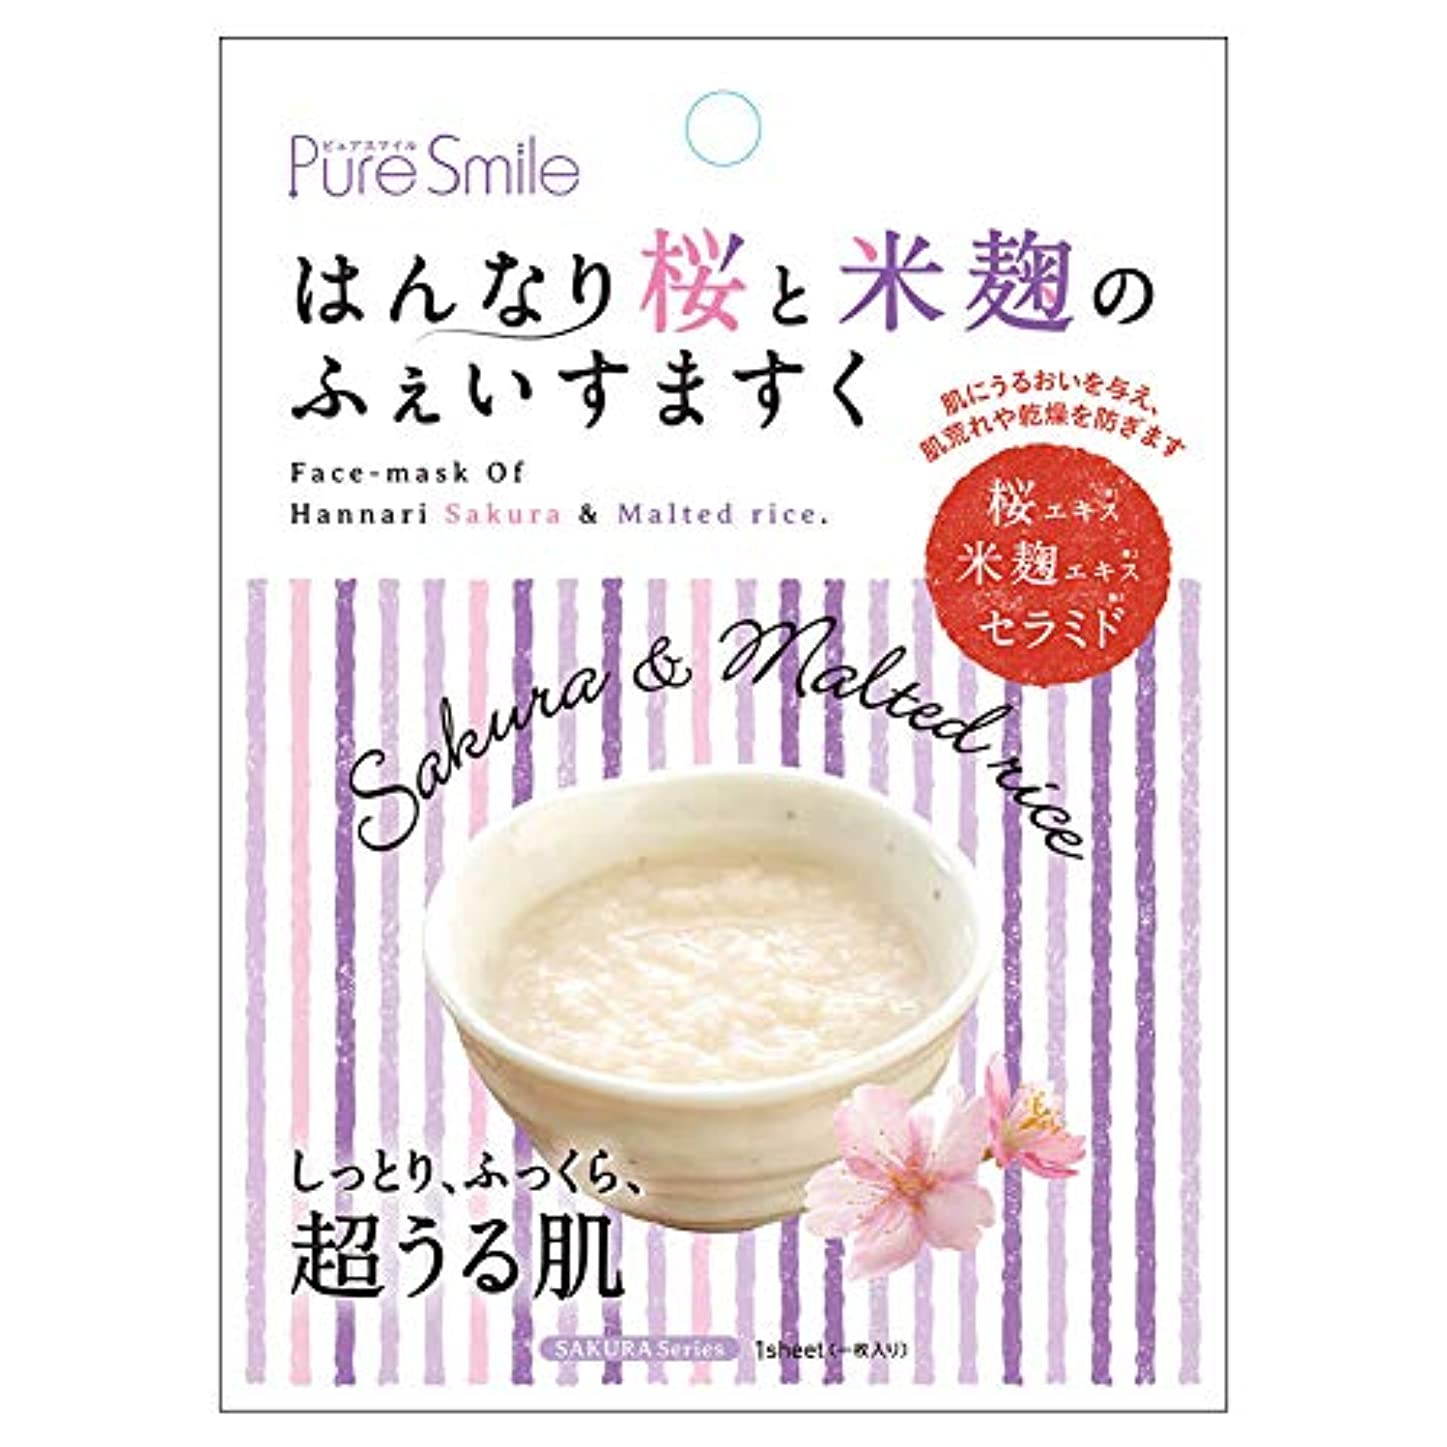 Pure Smile ピュアスマイル サクラエッセンスマスク SR02 はんなり桜と米麹